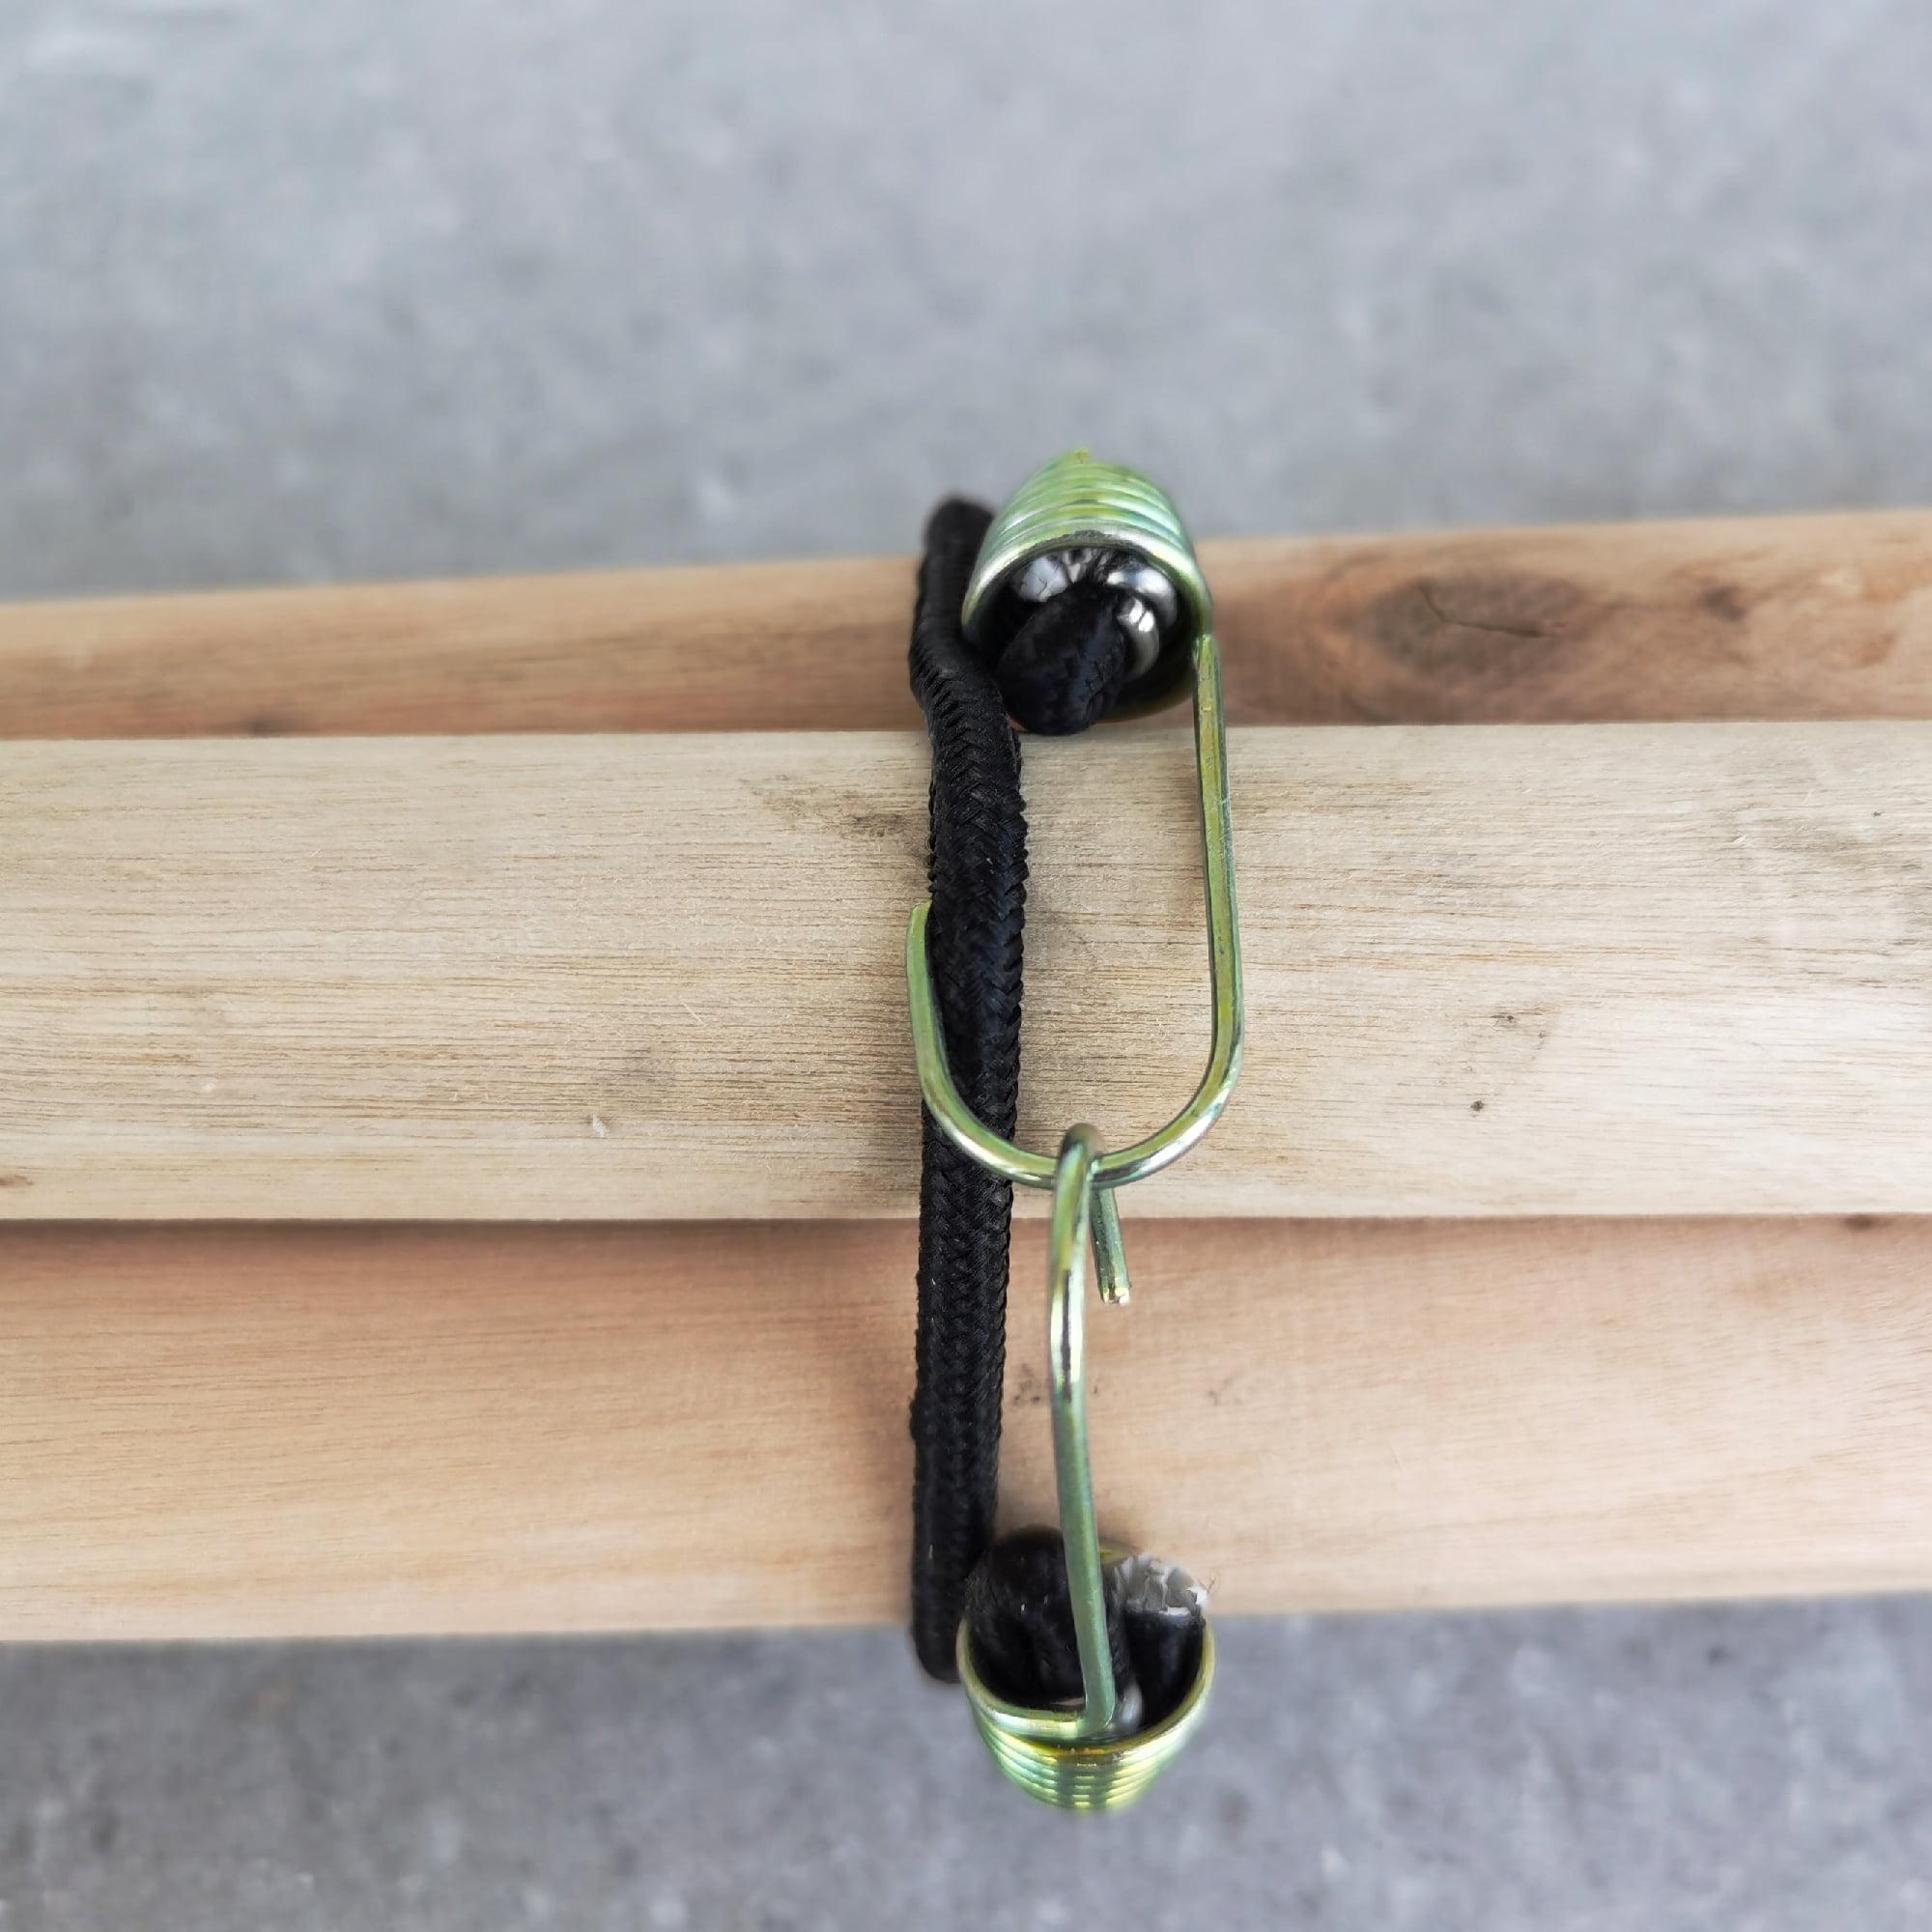 10pc Premium-Grade New Virgin Rubber 8 Bungee Ball Cords Tarps Wrap Hose /& Cords Pro Tools Canopy